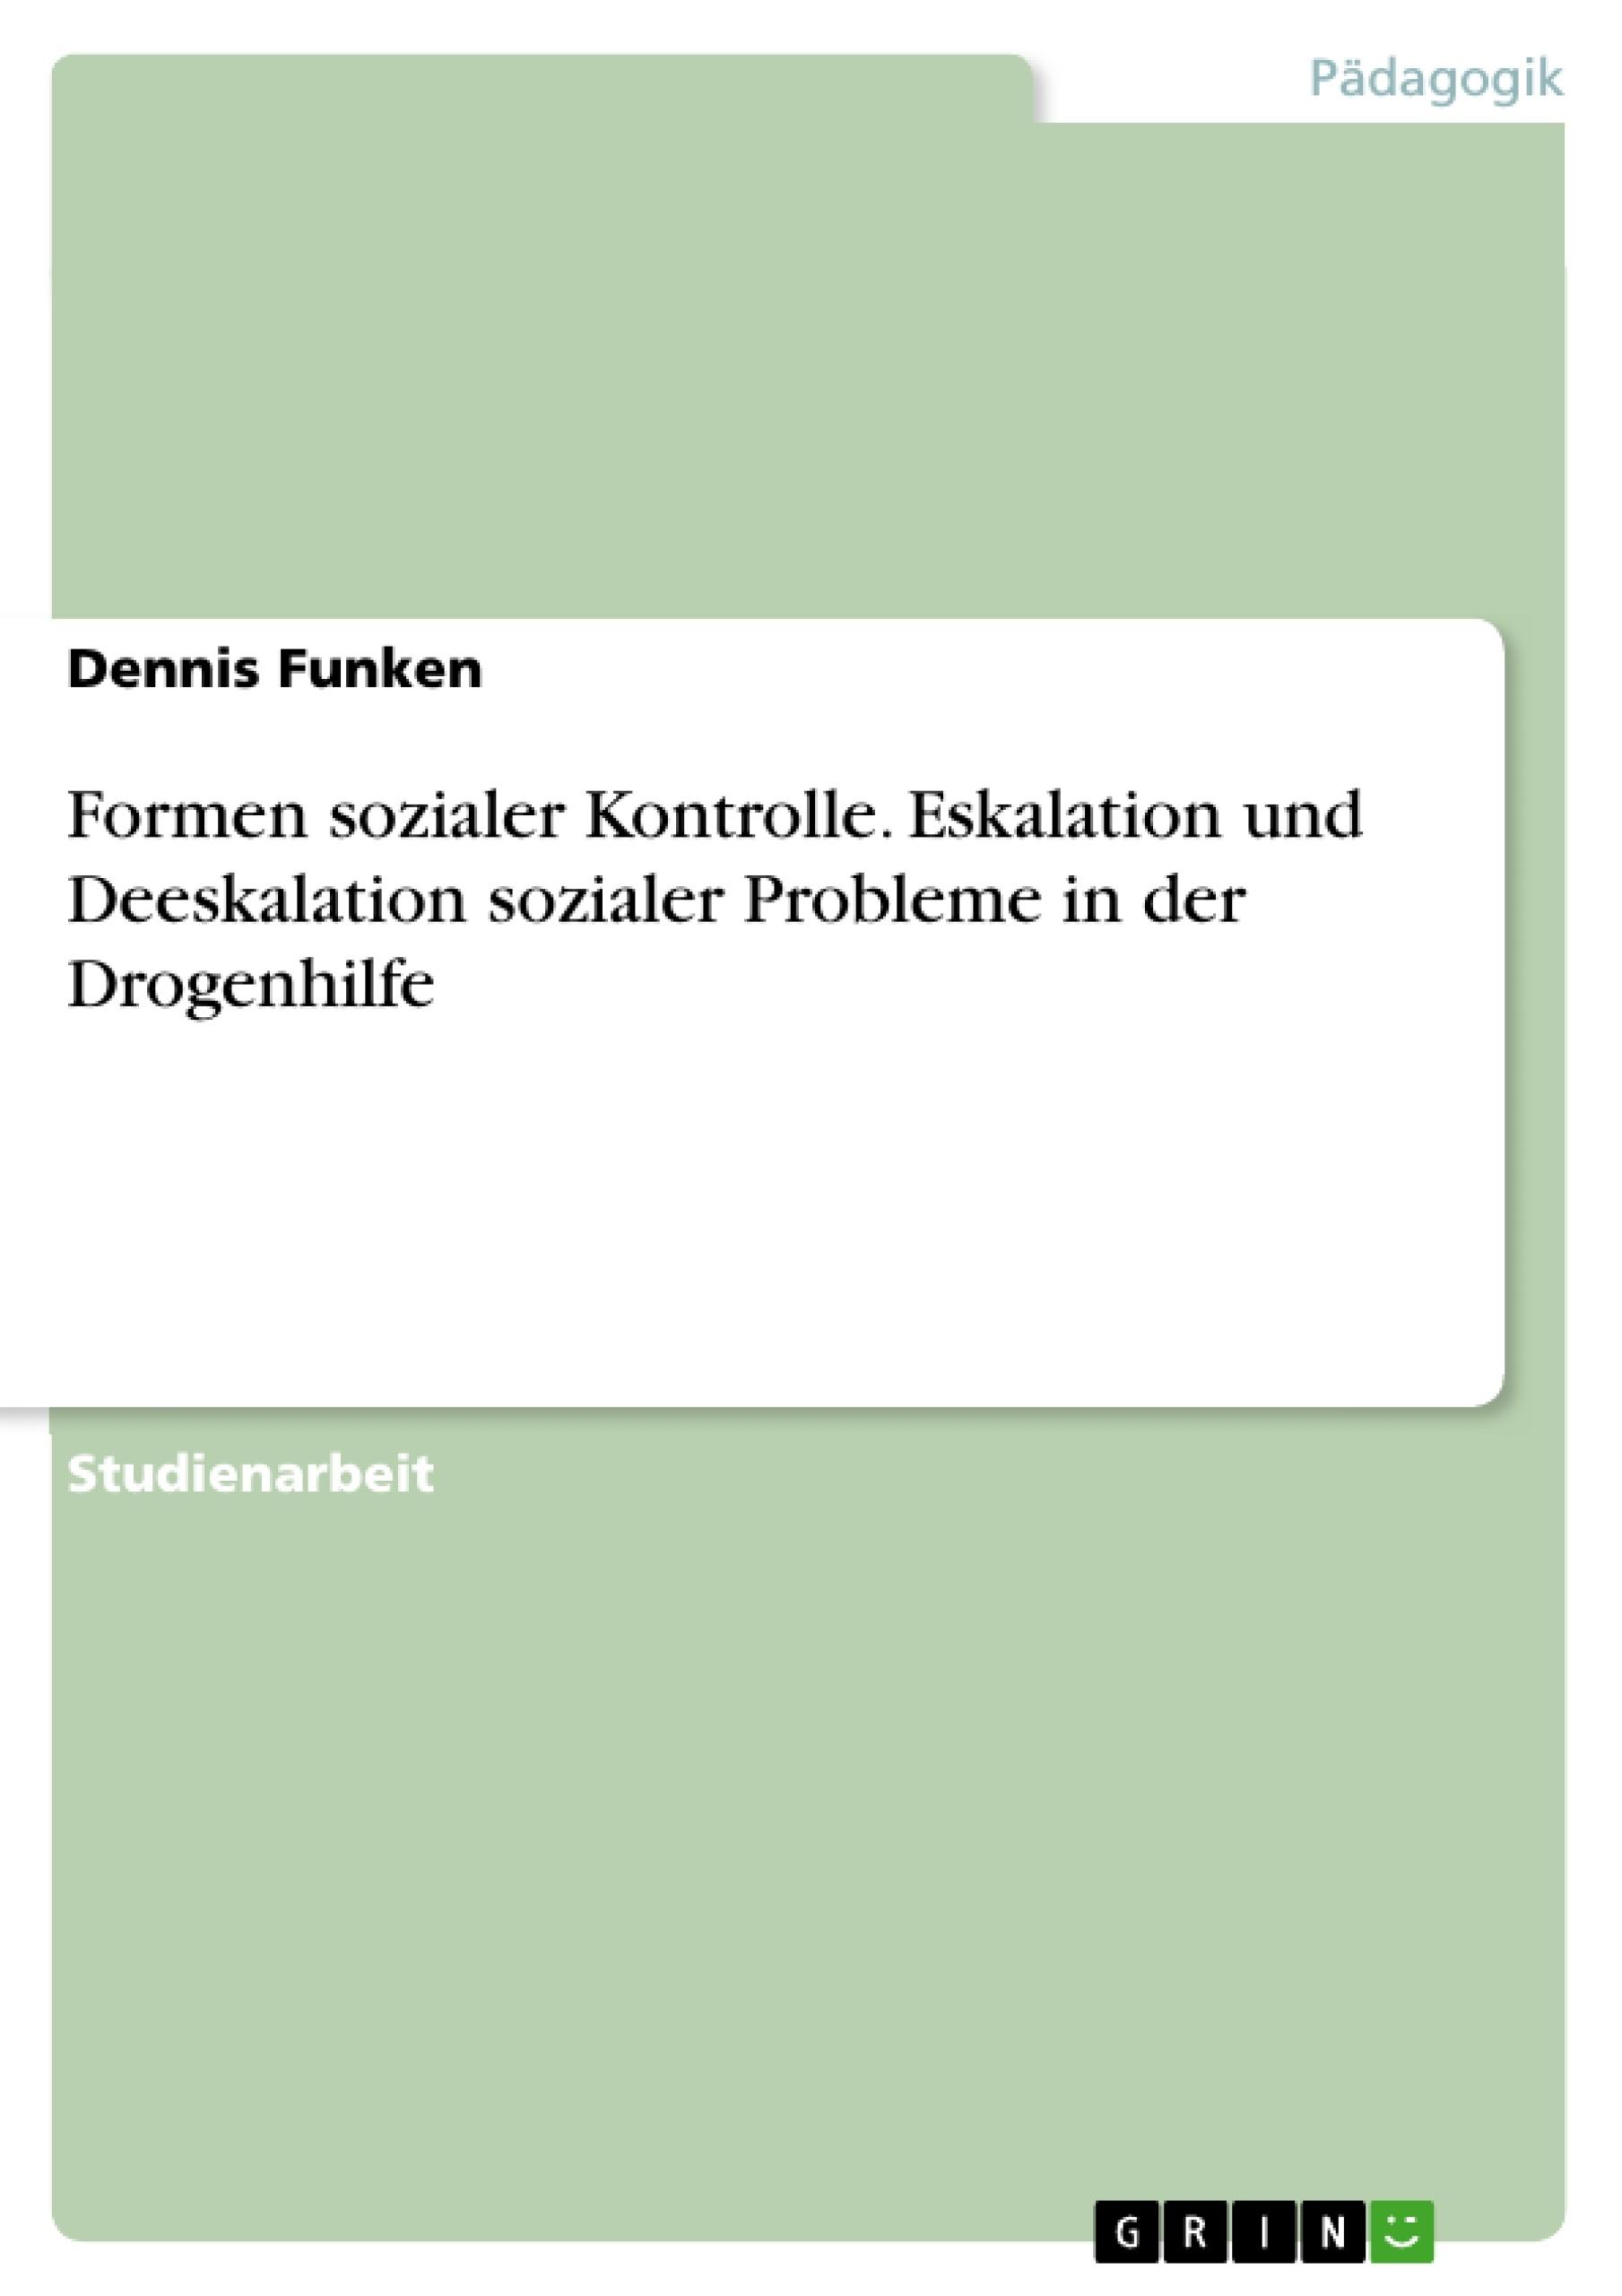 Titel: Formen sozialer Kontrolle. Eskalation und Deeskalation sozialer Probleme in der Drogenhilfe